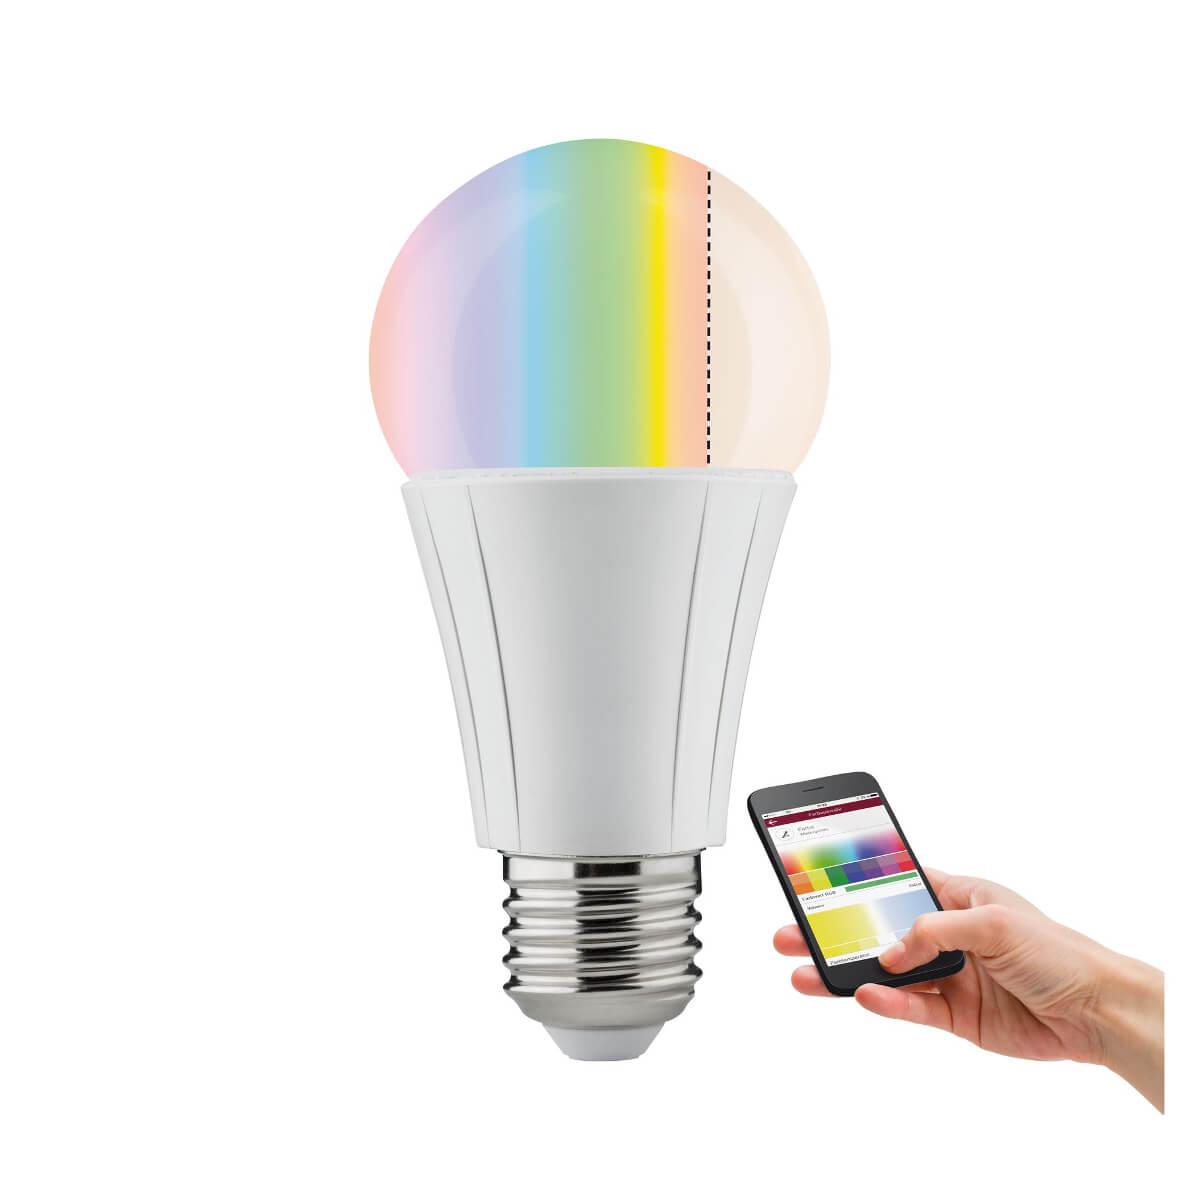 Paulmann SmartHome ZigBee LED AGL Soret 7,5 W E27 RGBW, Leuchtmittel mit Farbsteuerung per App